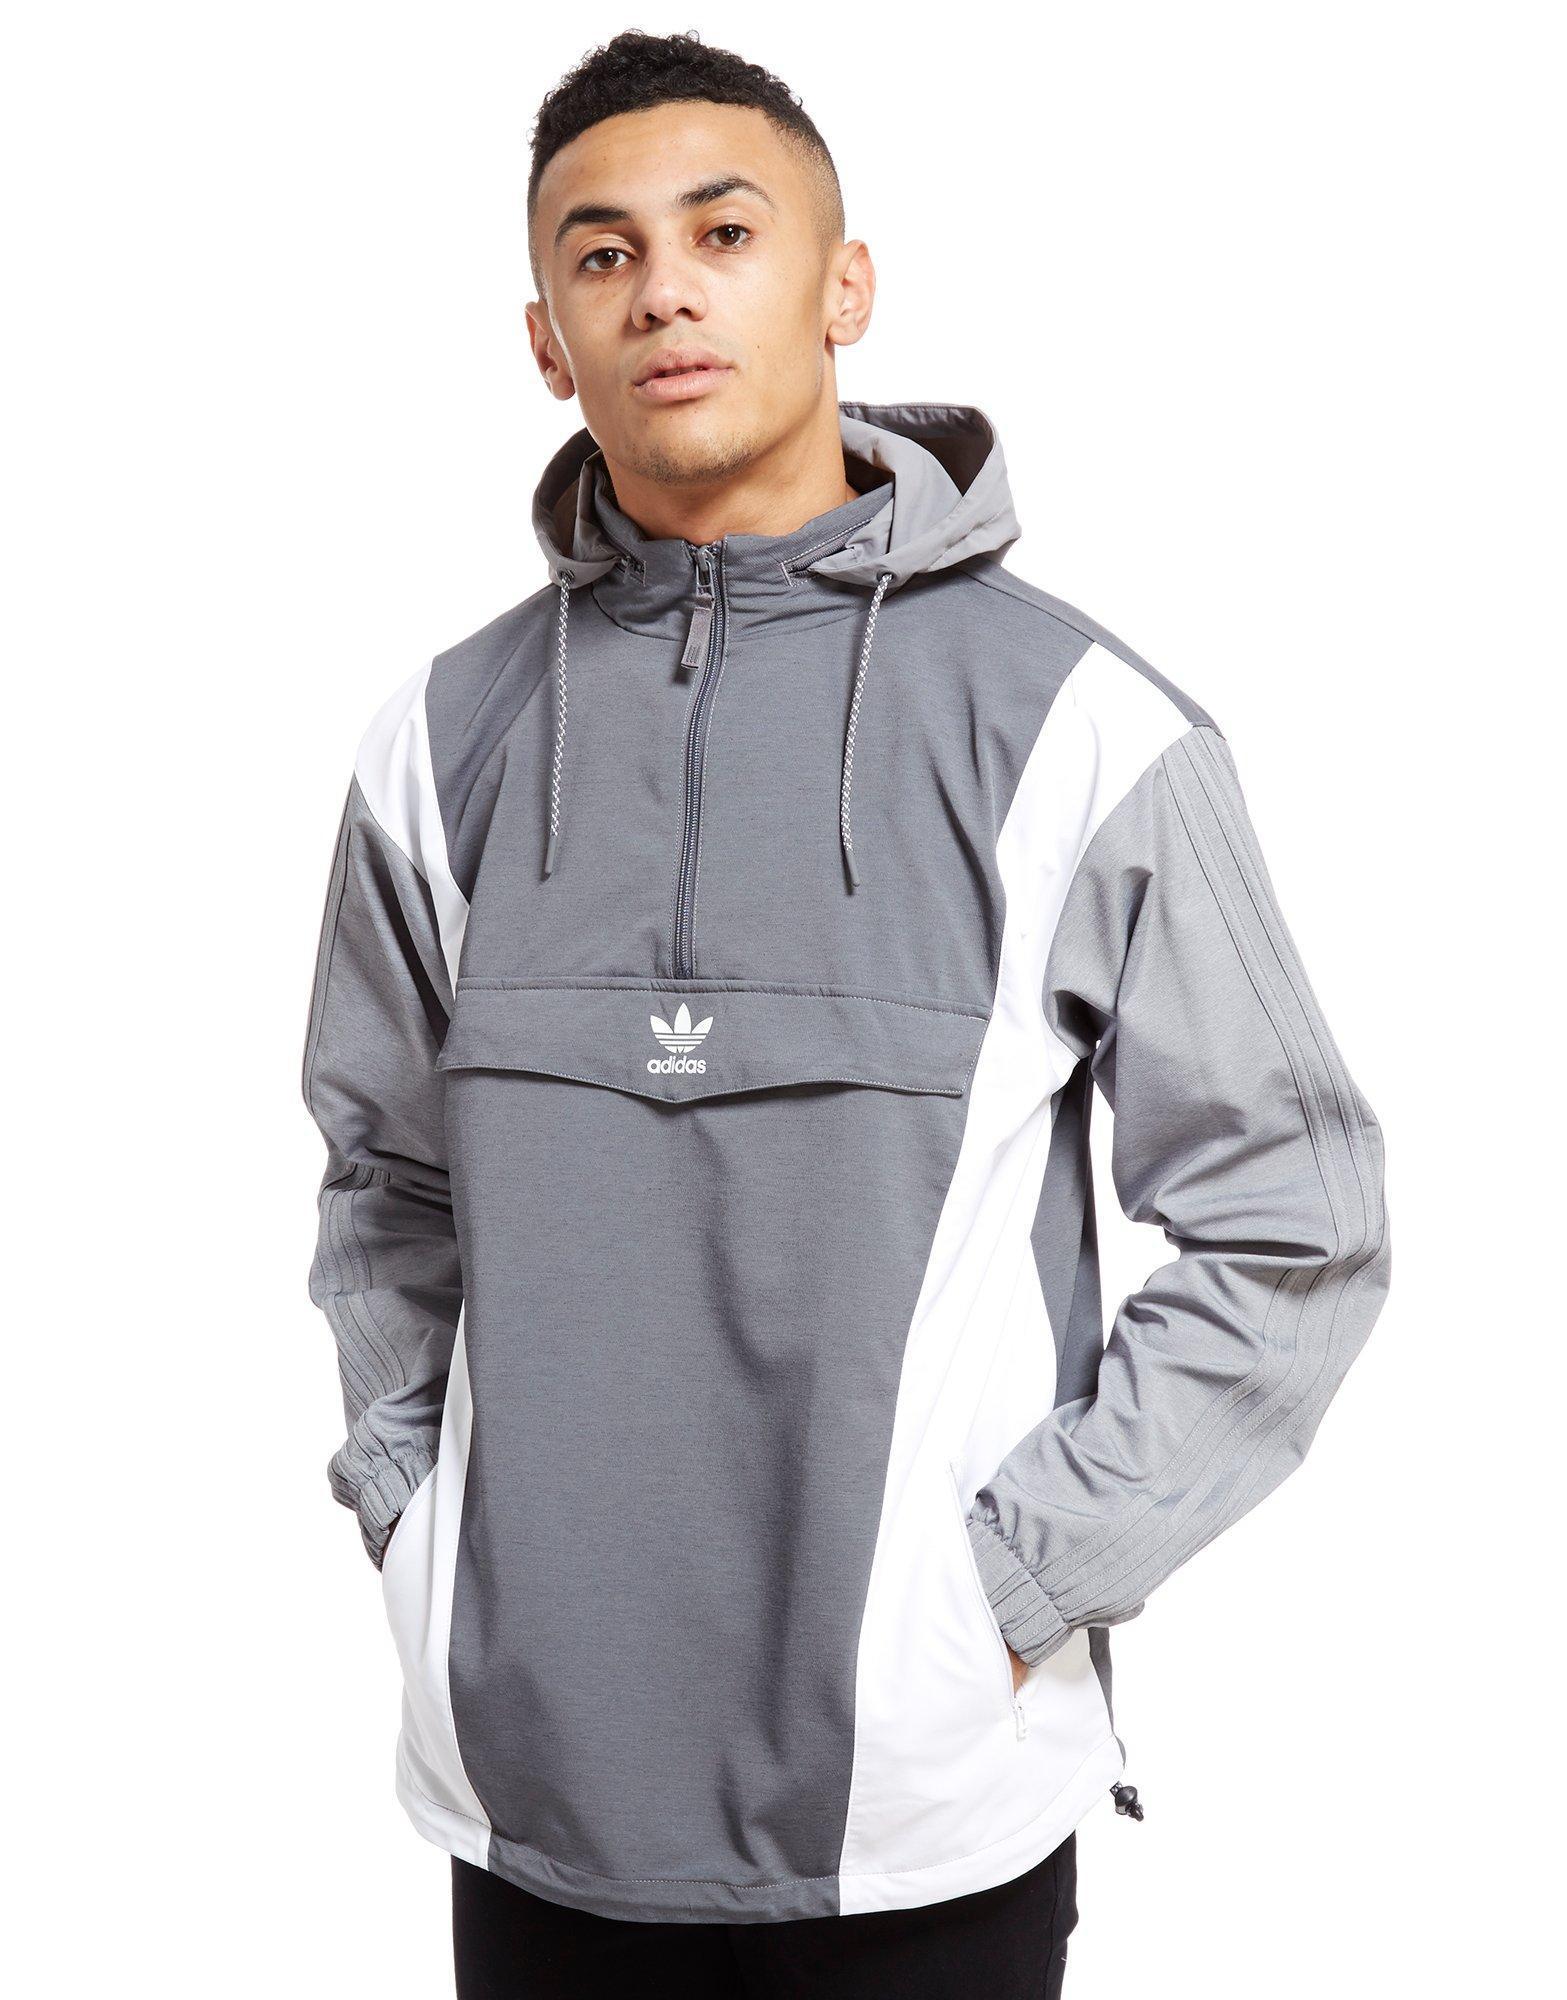 Lyst - adidas Originals Nova Half Zip Jacket in Gray for Men 96230ba6873